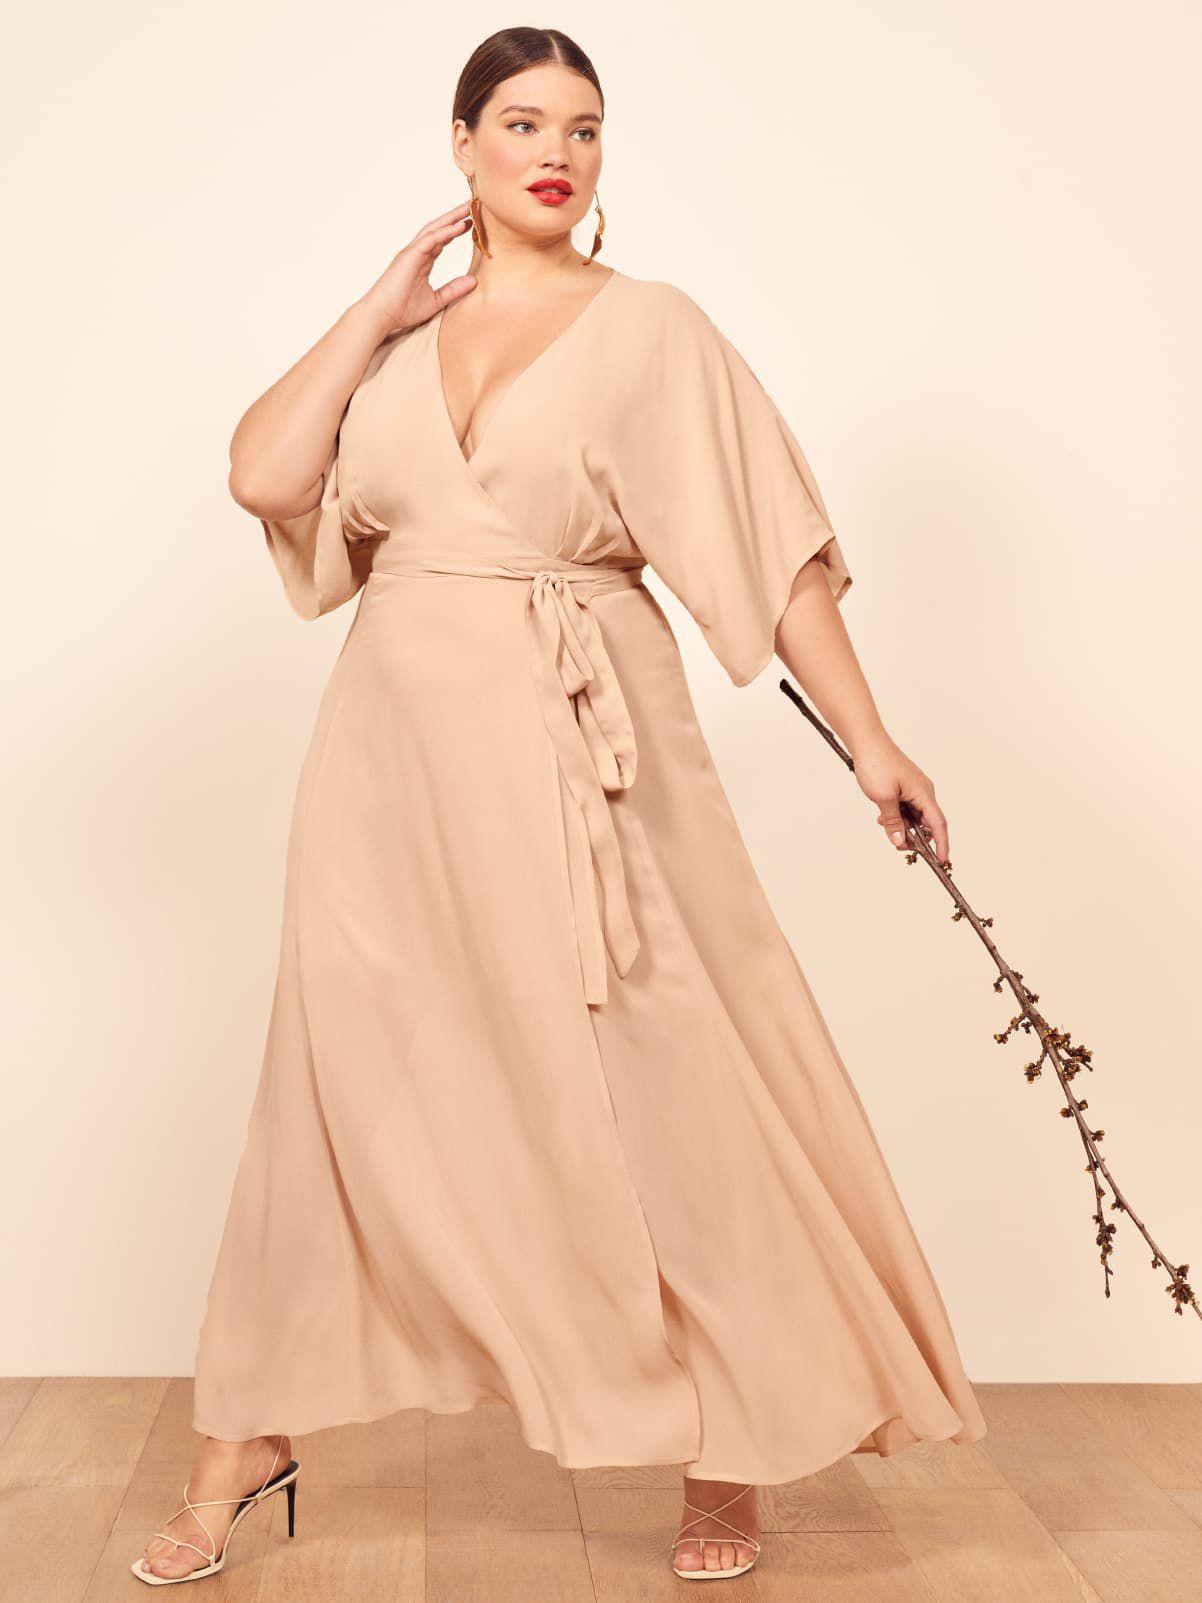 Reformation Winslow Dress, $268